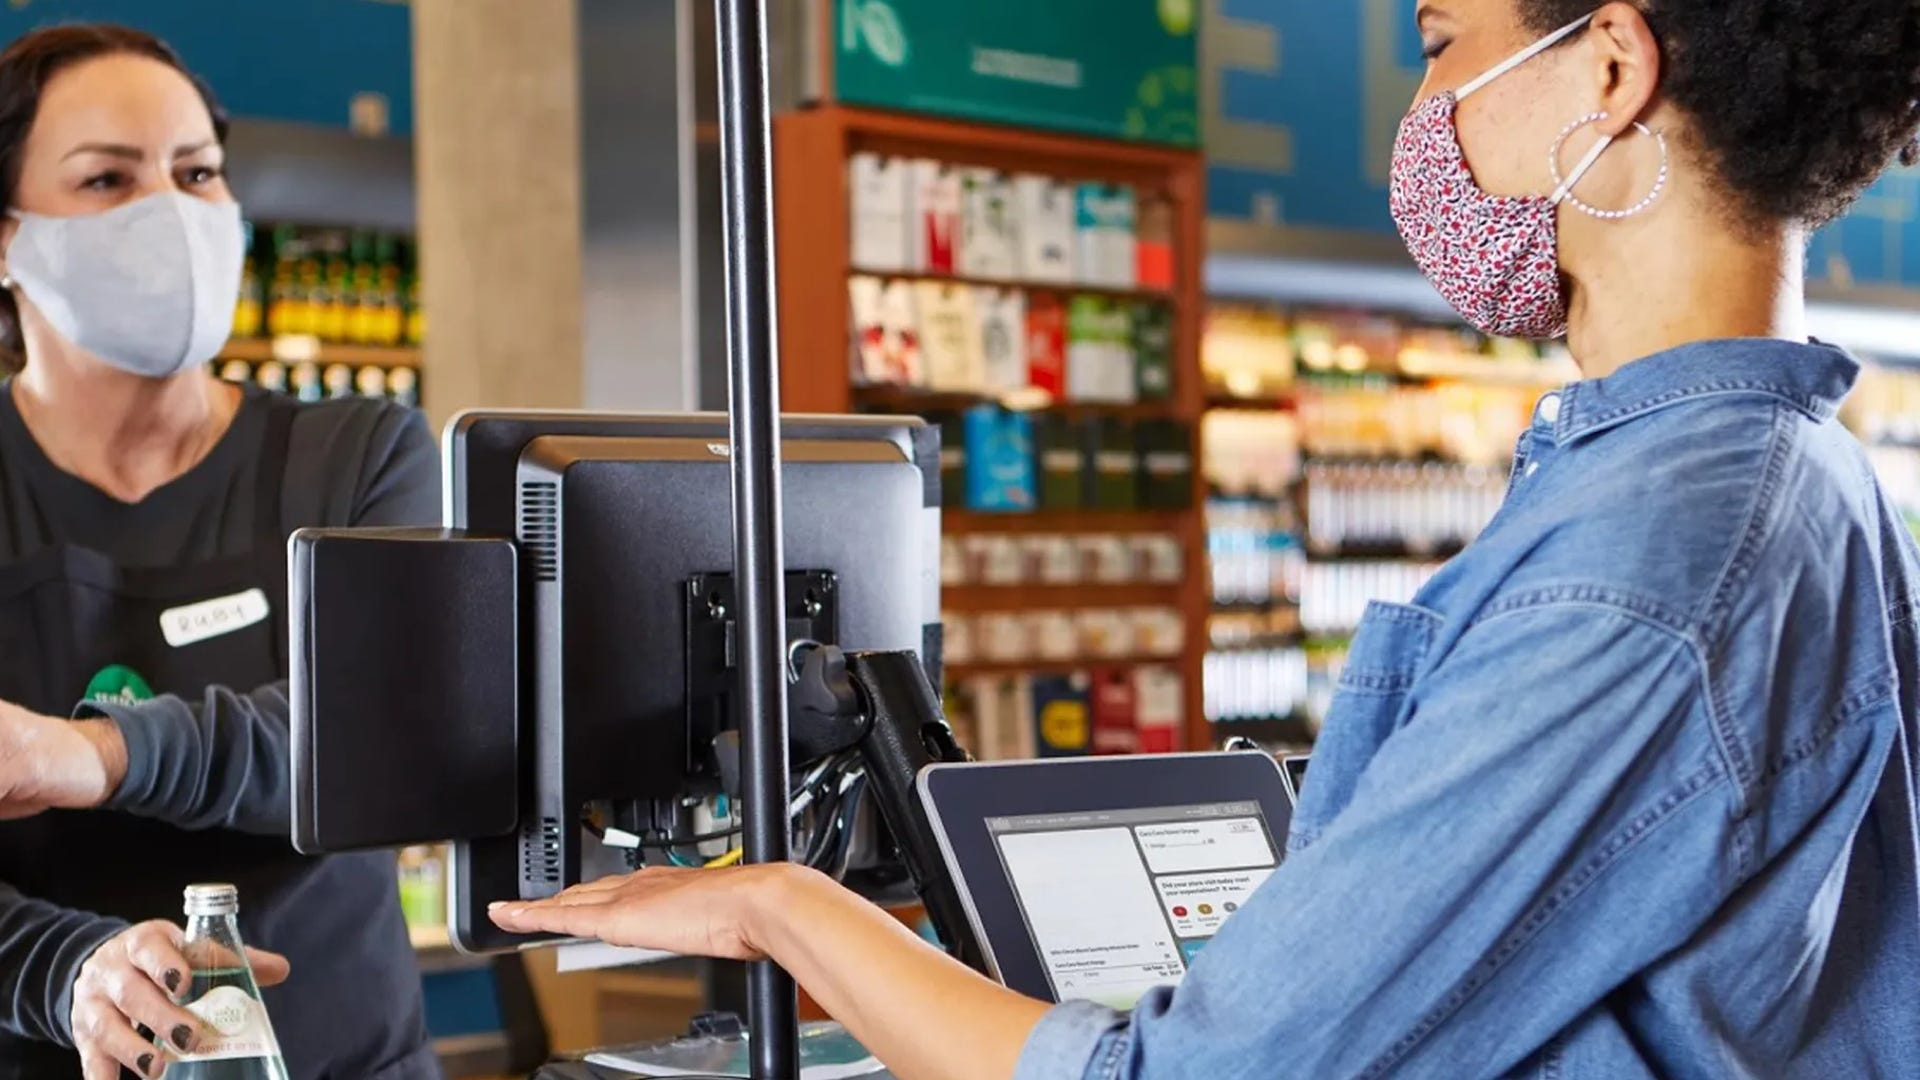 amazon palm scanning payment technology